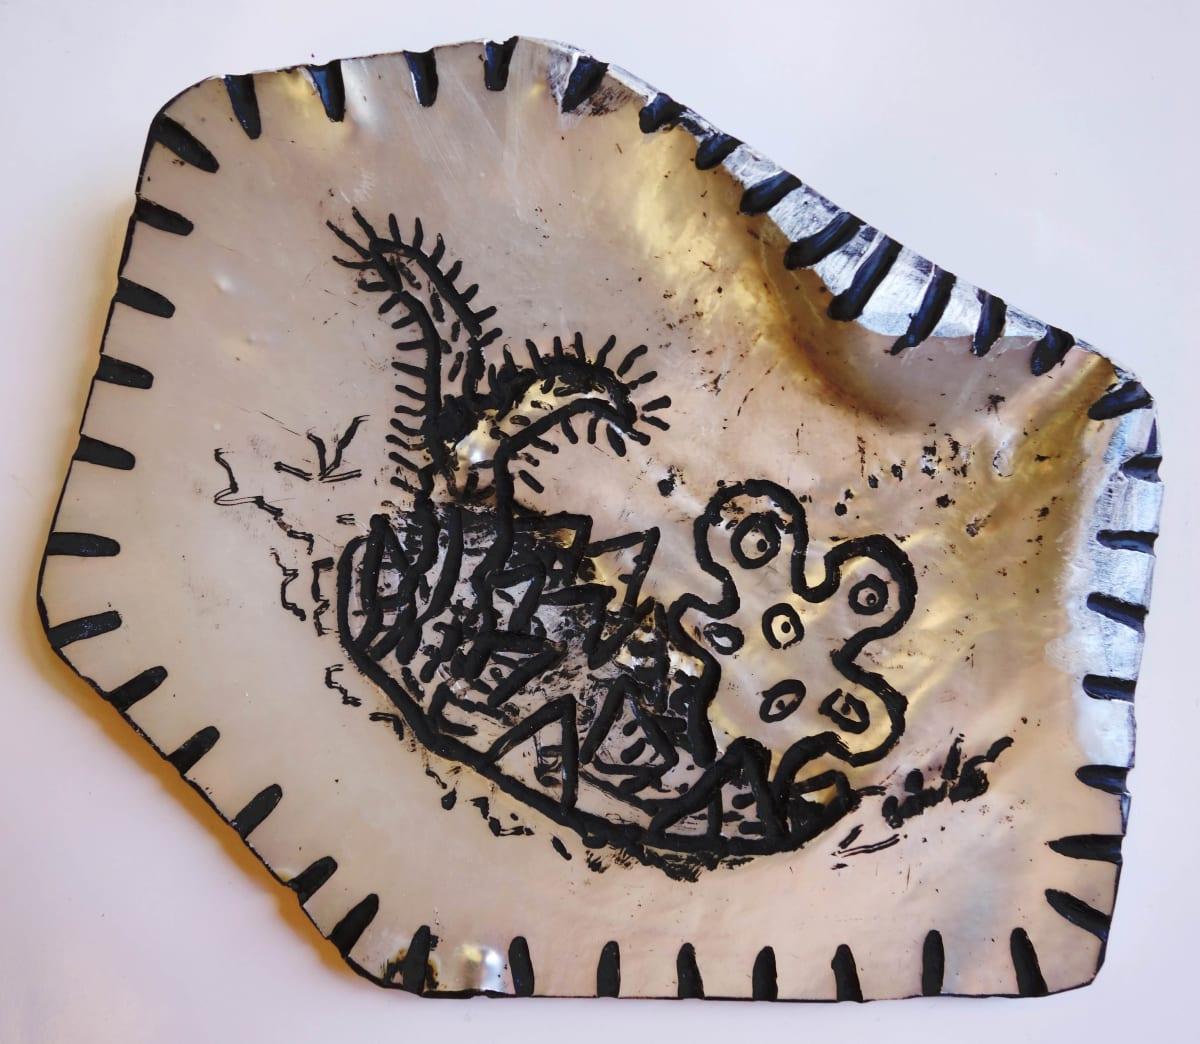 Stephen Eastaugh SHELL-13, 2015 Pearl shell and acrylic